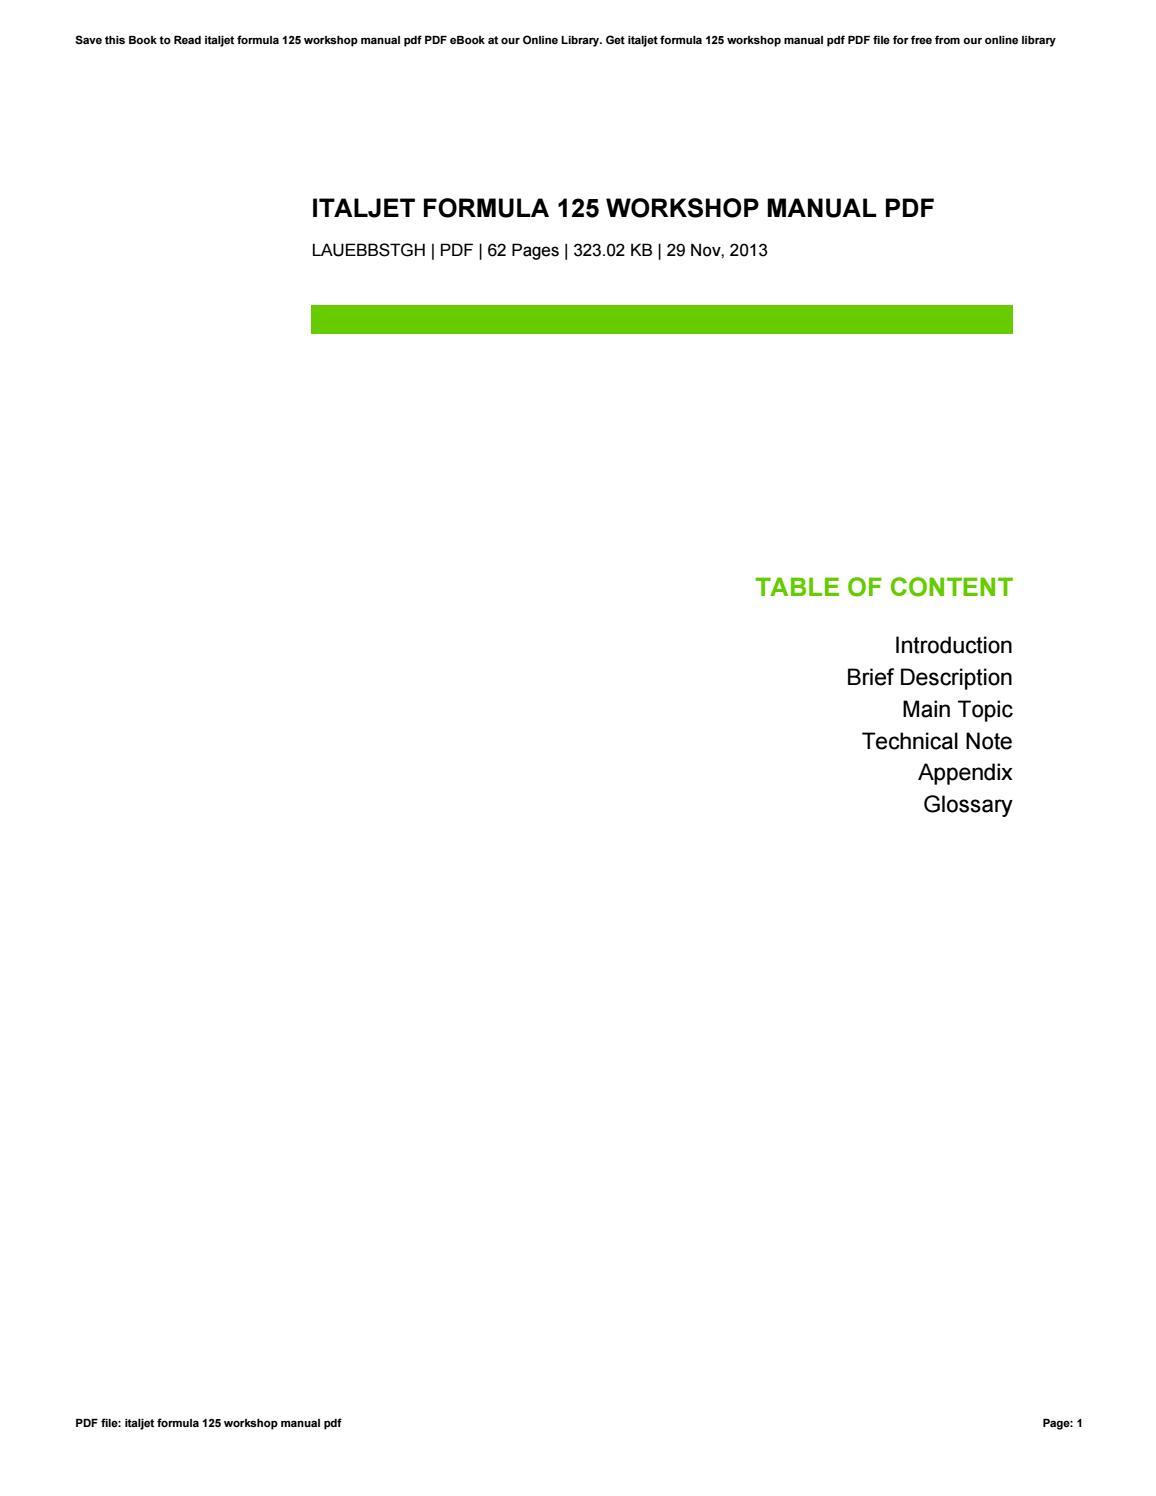 Italjet Formula 125 Workshop Manual Pdf By